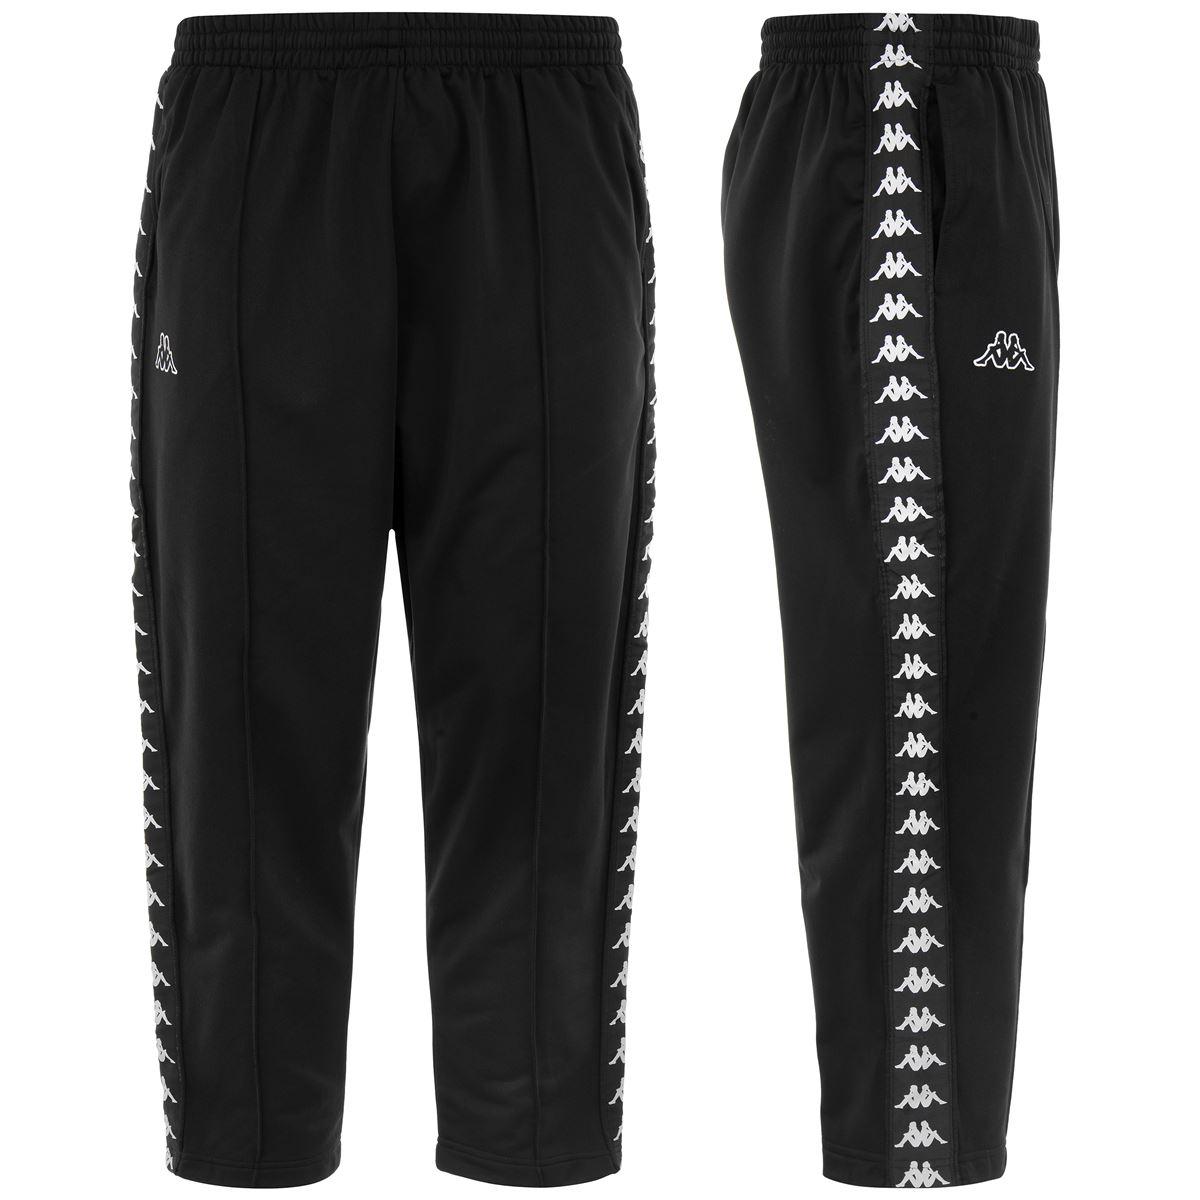 Kappa Pants Man 222 BANDA ADERN SPORT STREET Sport Trousers